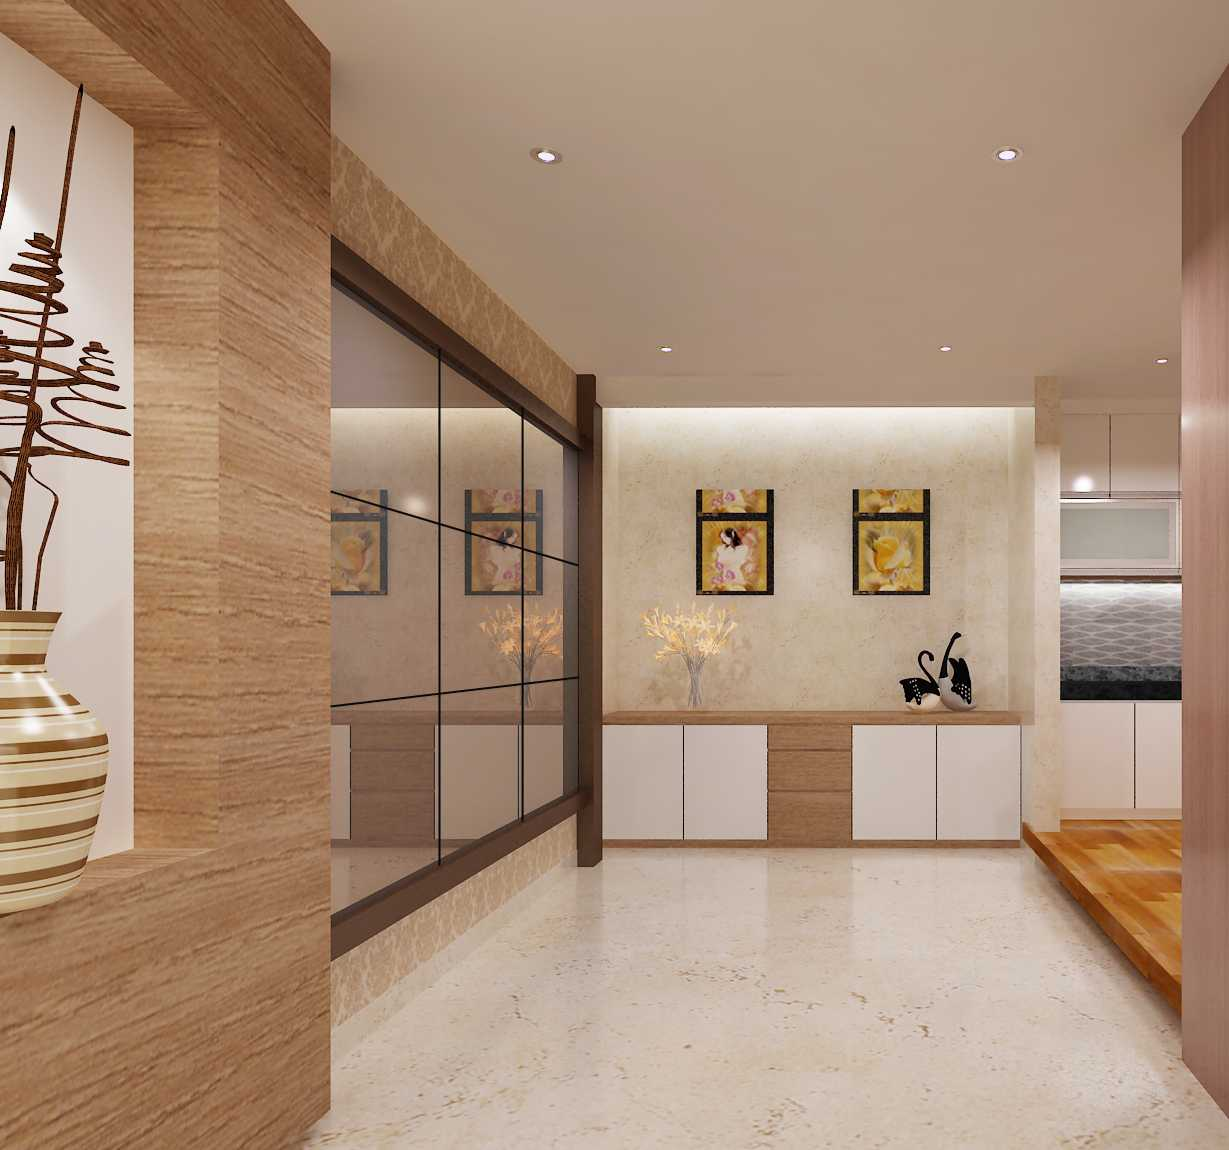 Yohanes Khouw Minimalis House At Green Mansion Jakarta Barat Jakarta Barat Ruang-Makanputih Minimalis 27662